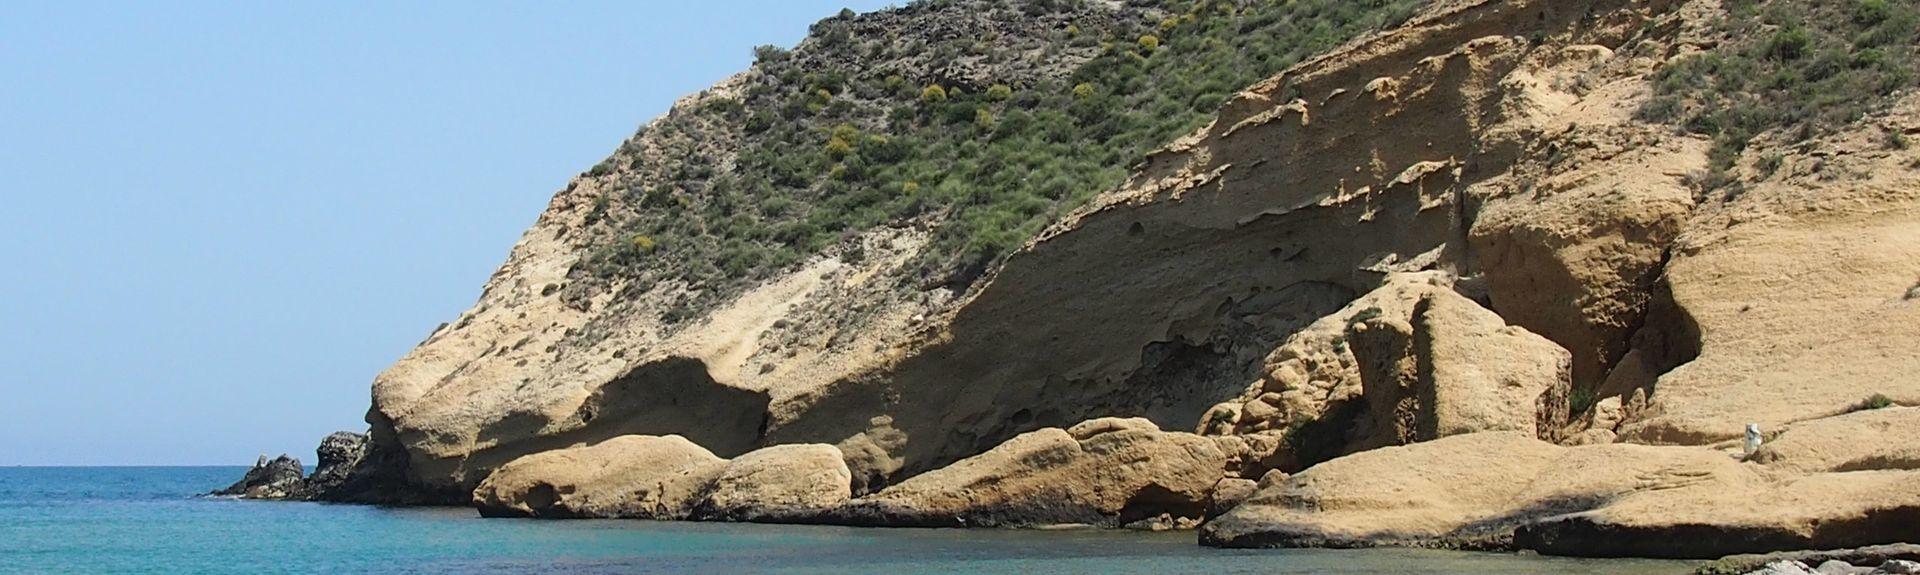 Mar de Pulpí, Pulpí, Andalucía, España